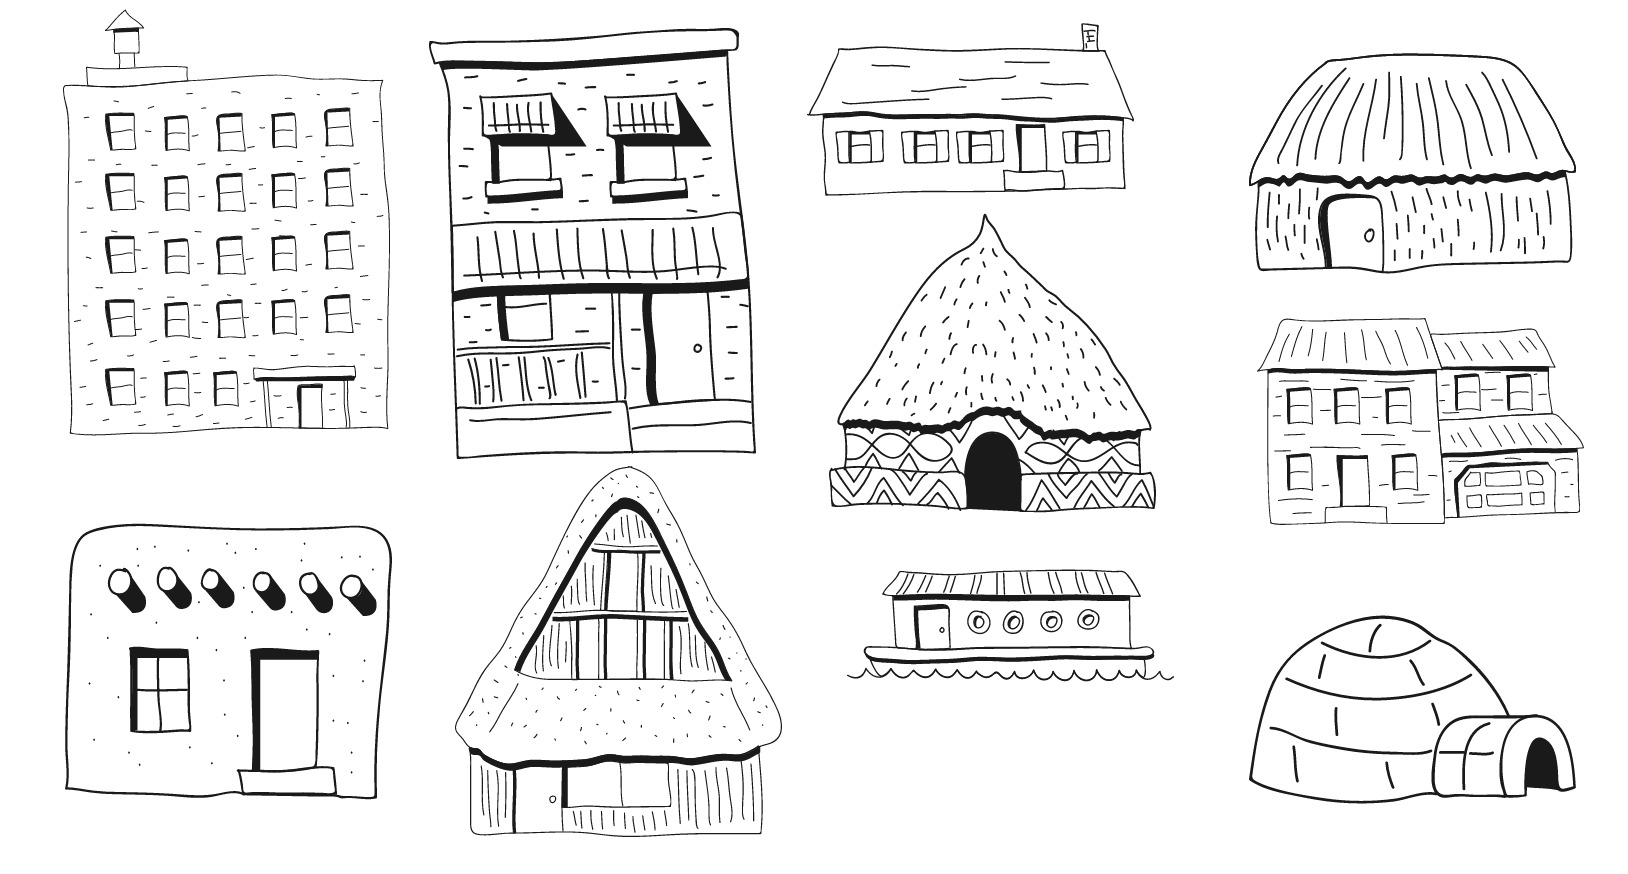 dibujo de casas autodraw